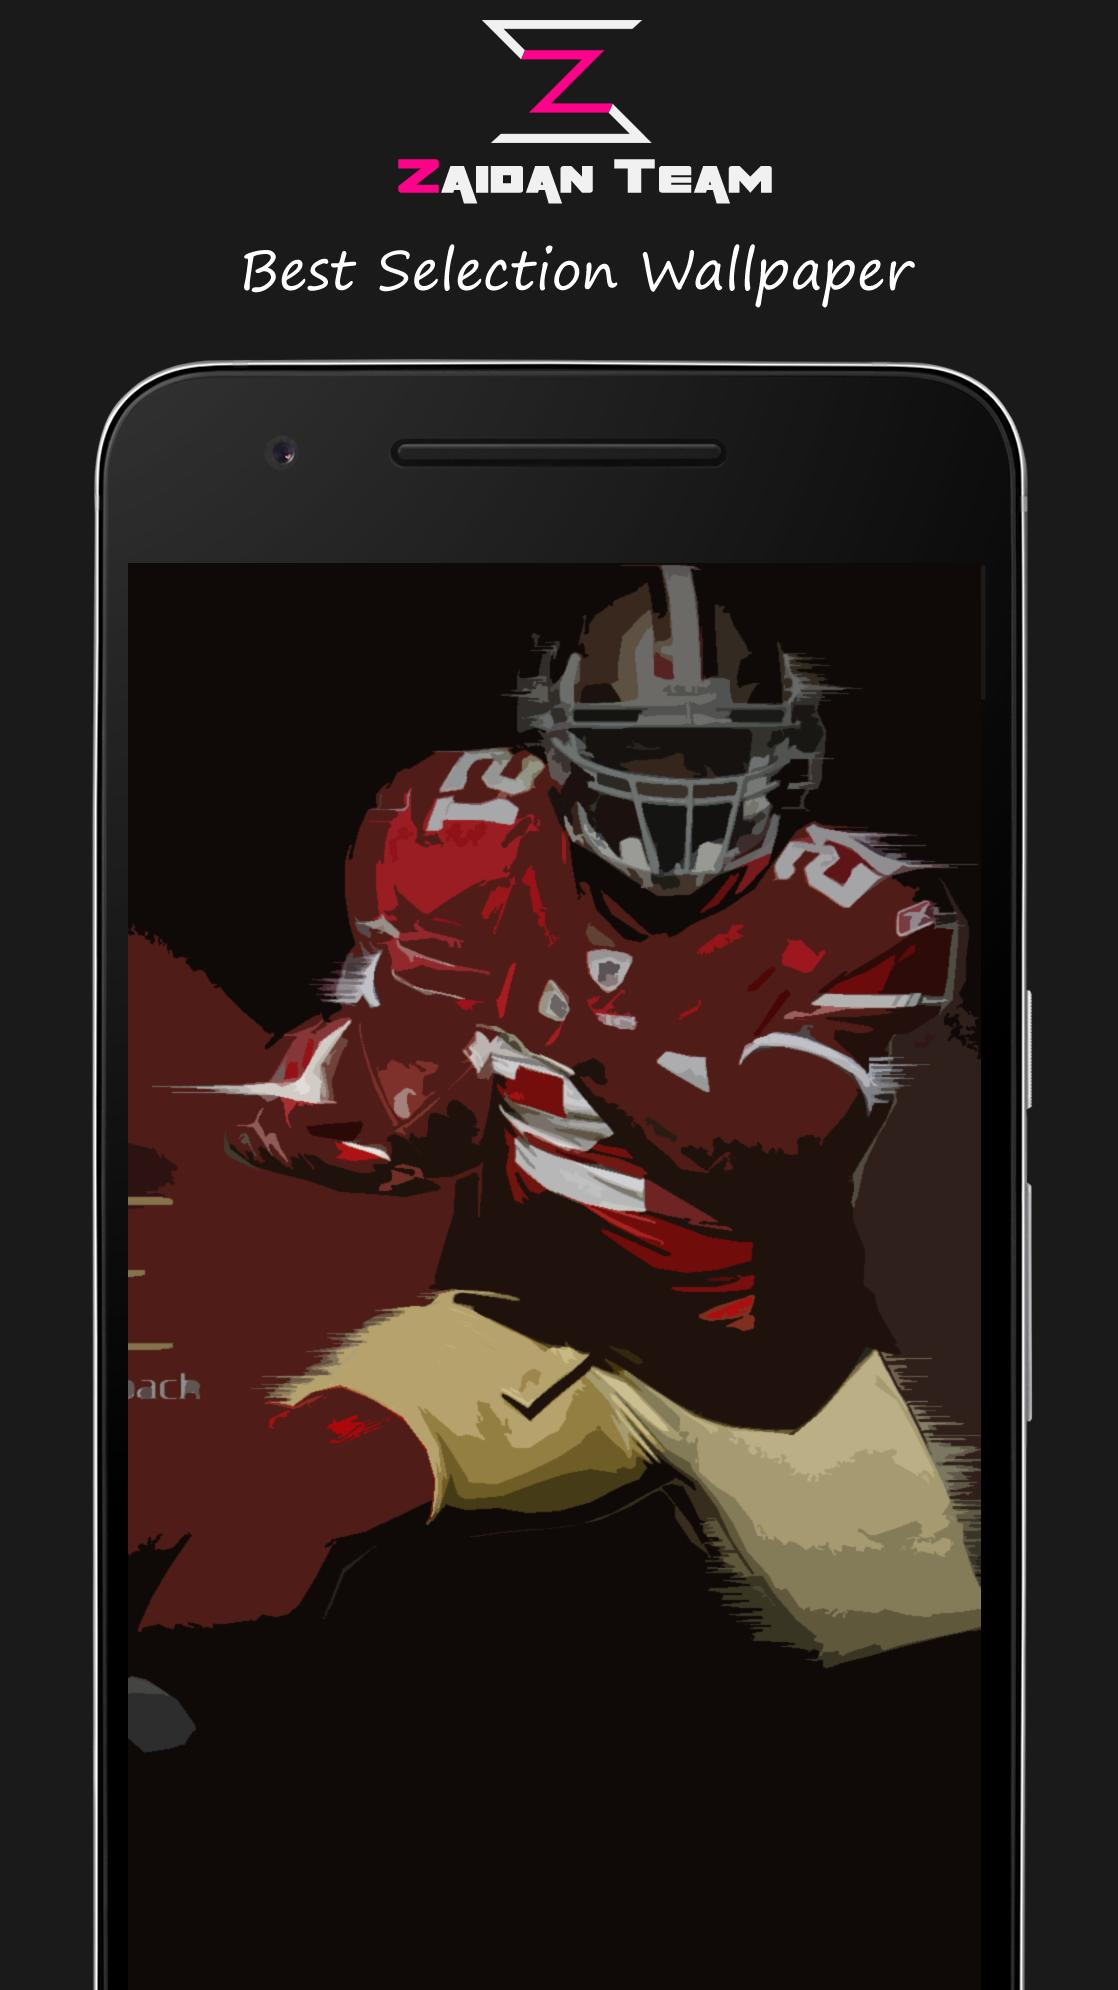 New San Francisco 49ers Wallpaper Art Hd Zaidan For Android